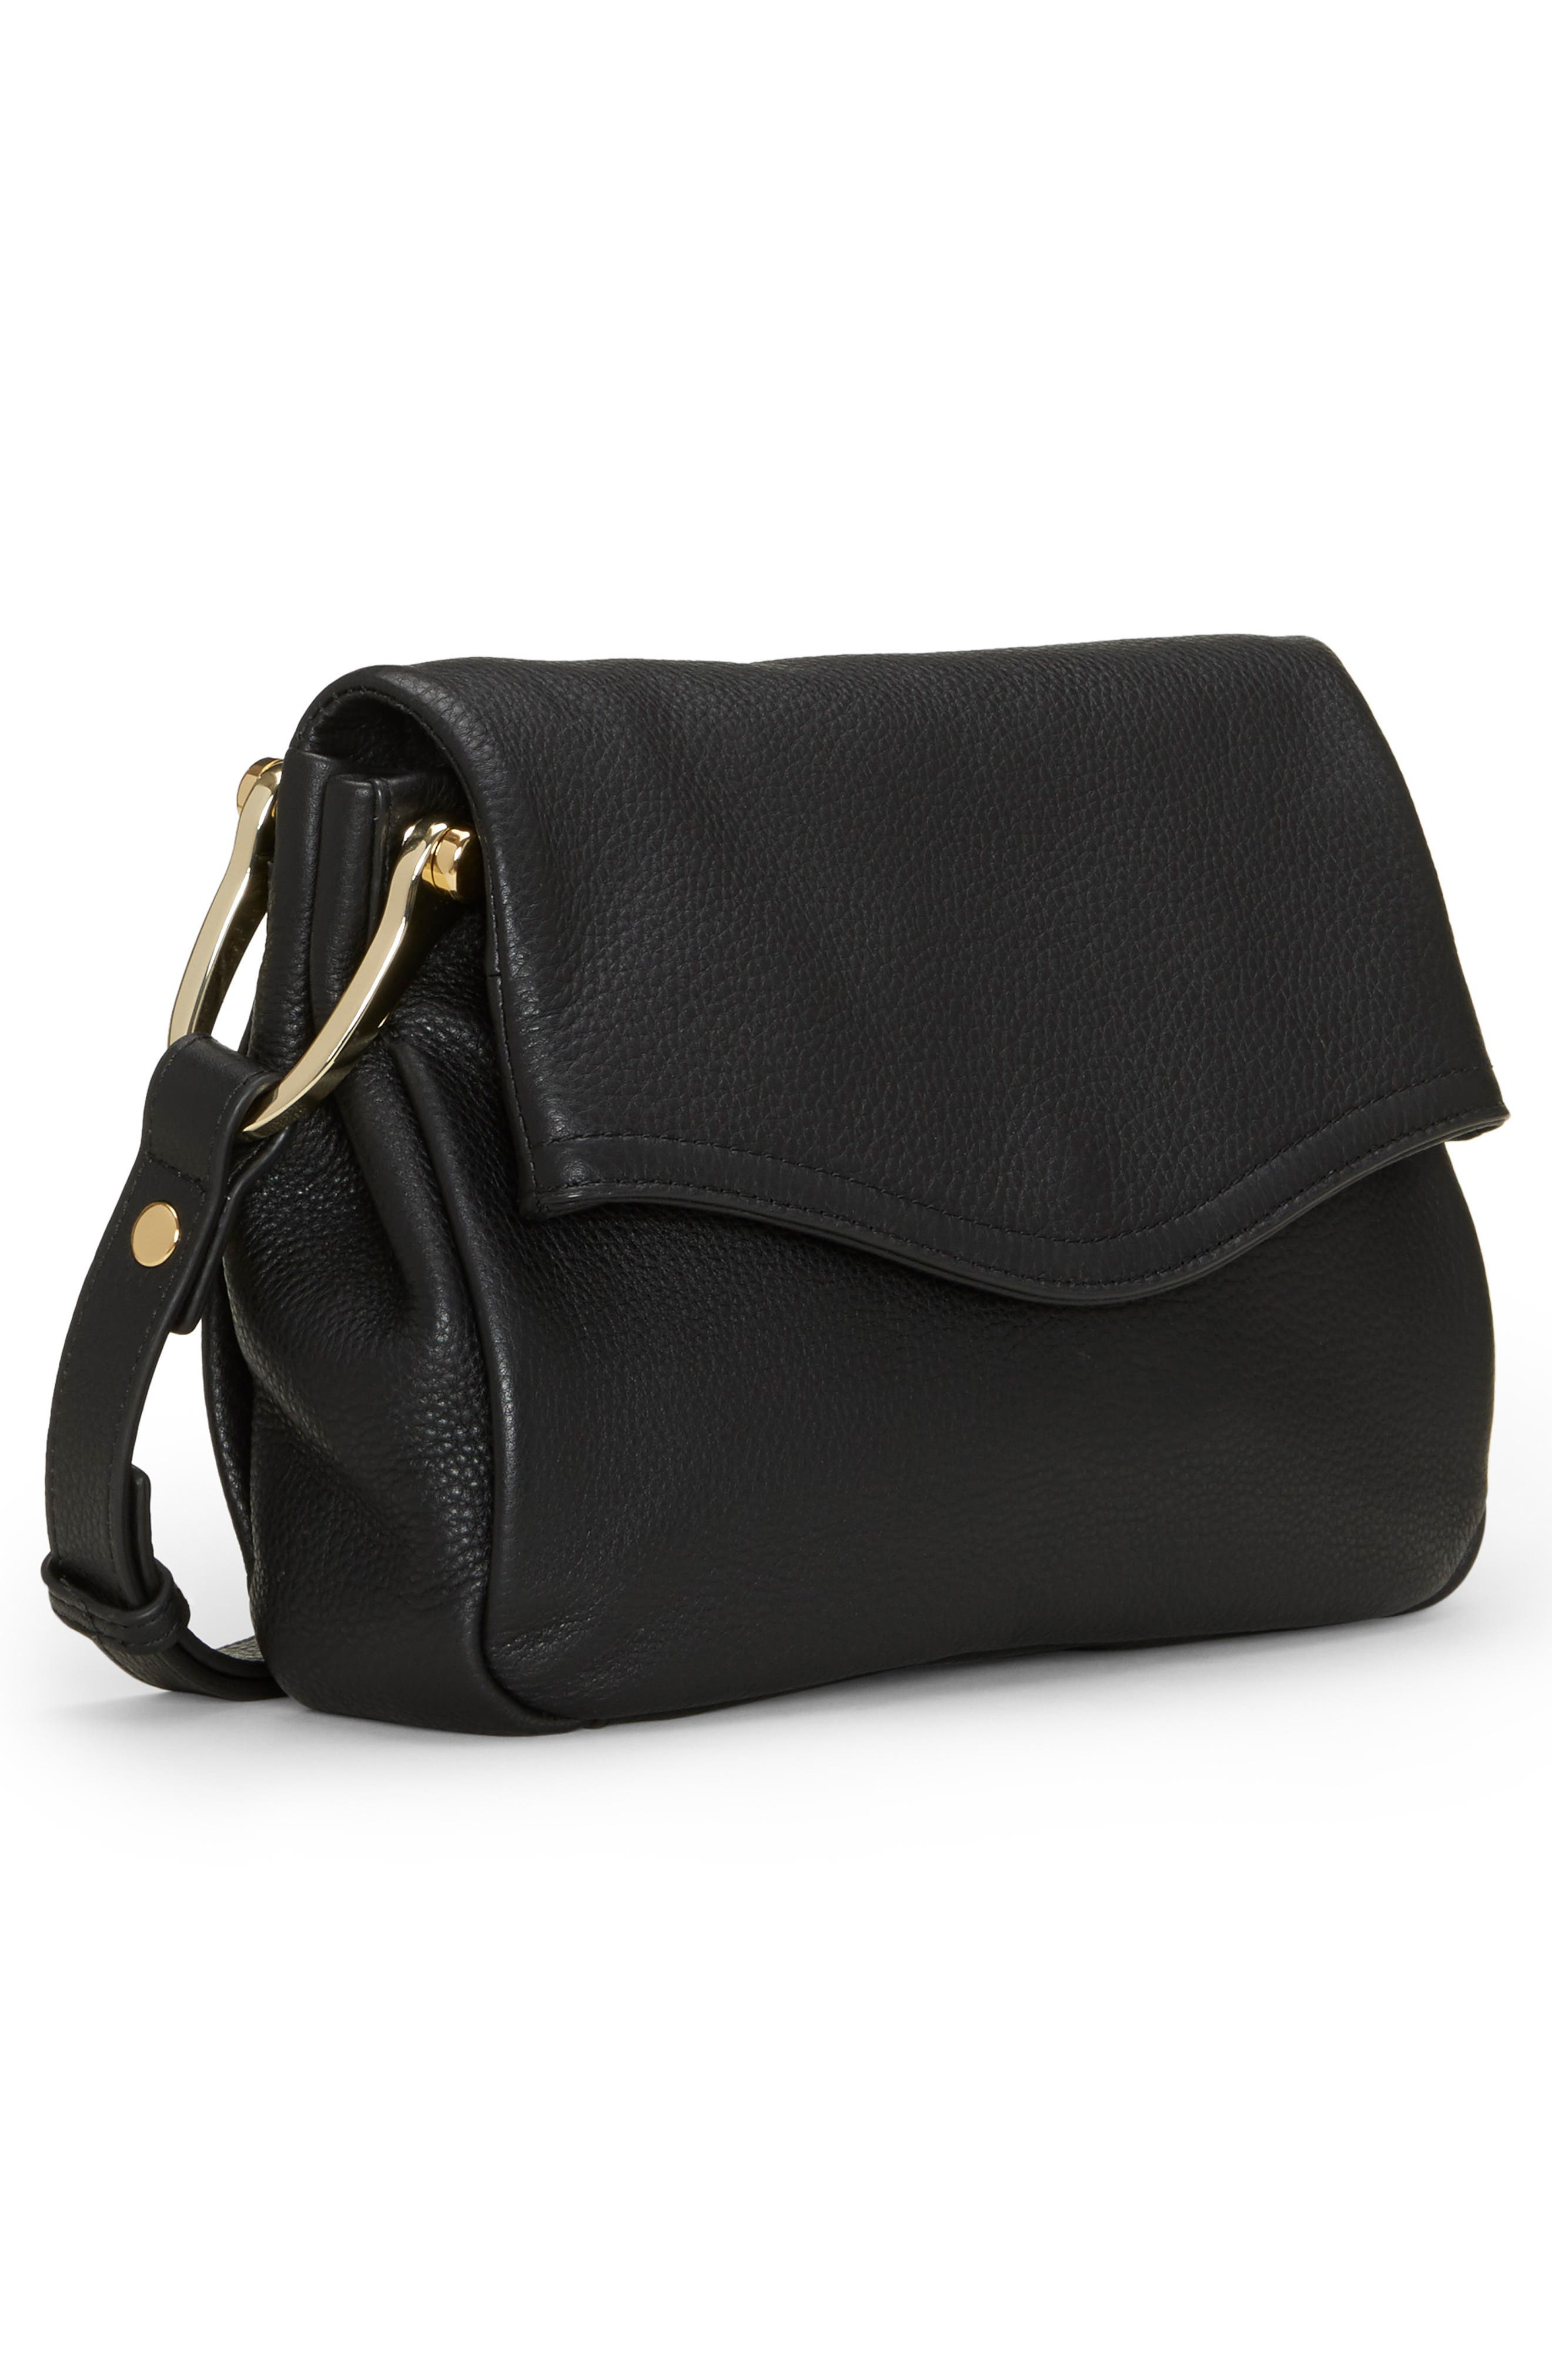 VINCE CAMUTO,                             Clem Leather Crossbody Bag,                             Alternate thumbnail 4, color,                             001